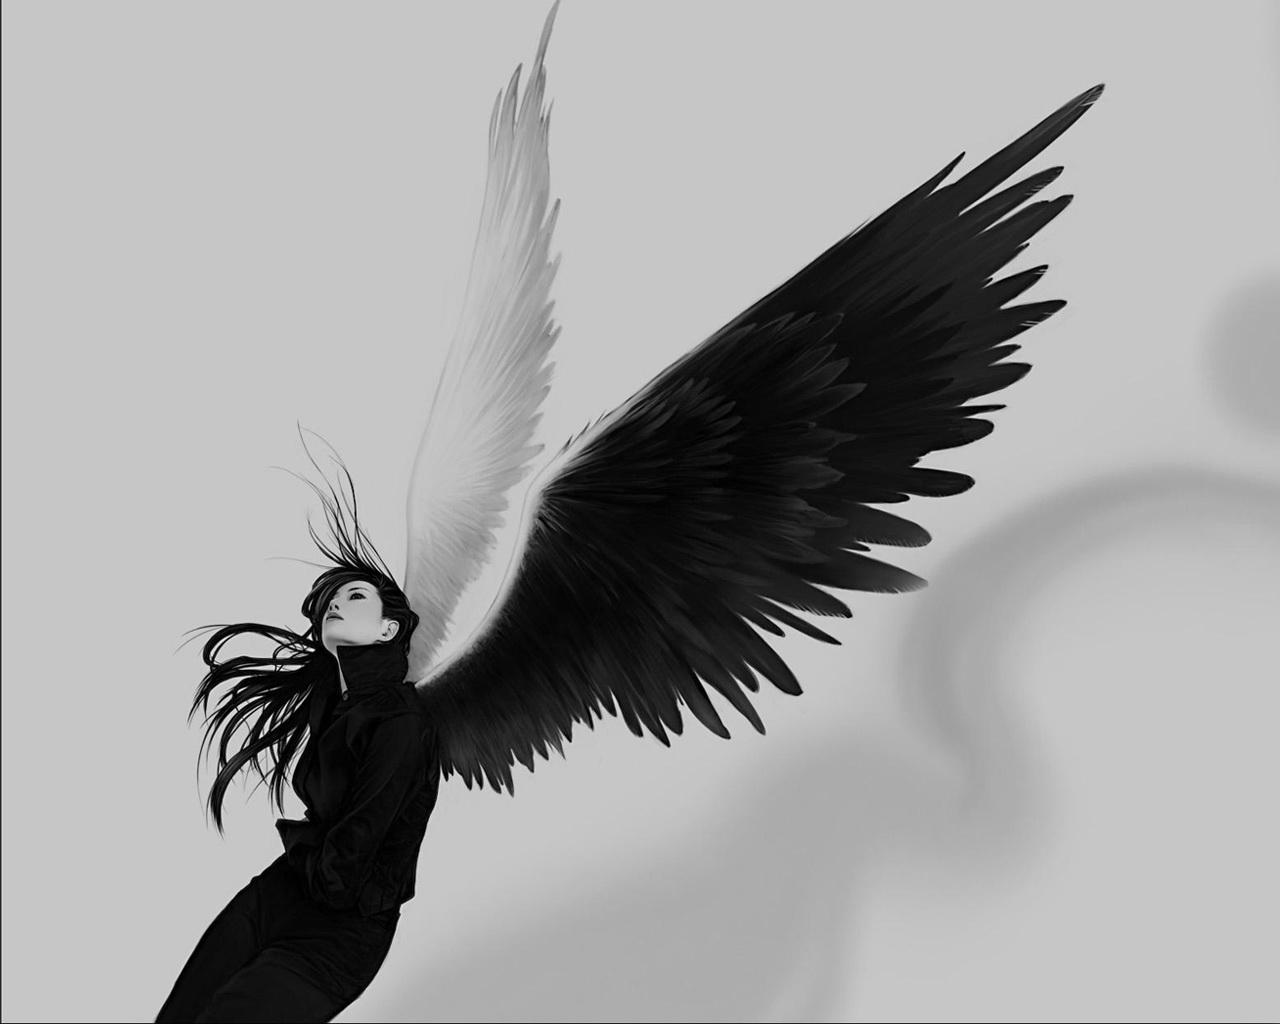 http://tugaleres.files.wordpress.com/2009/02/dark-angel-37616-188543.jpeg